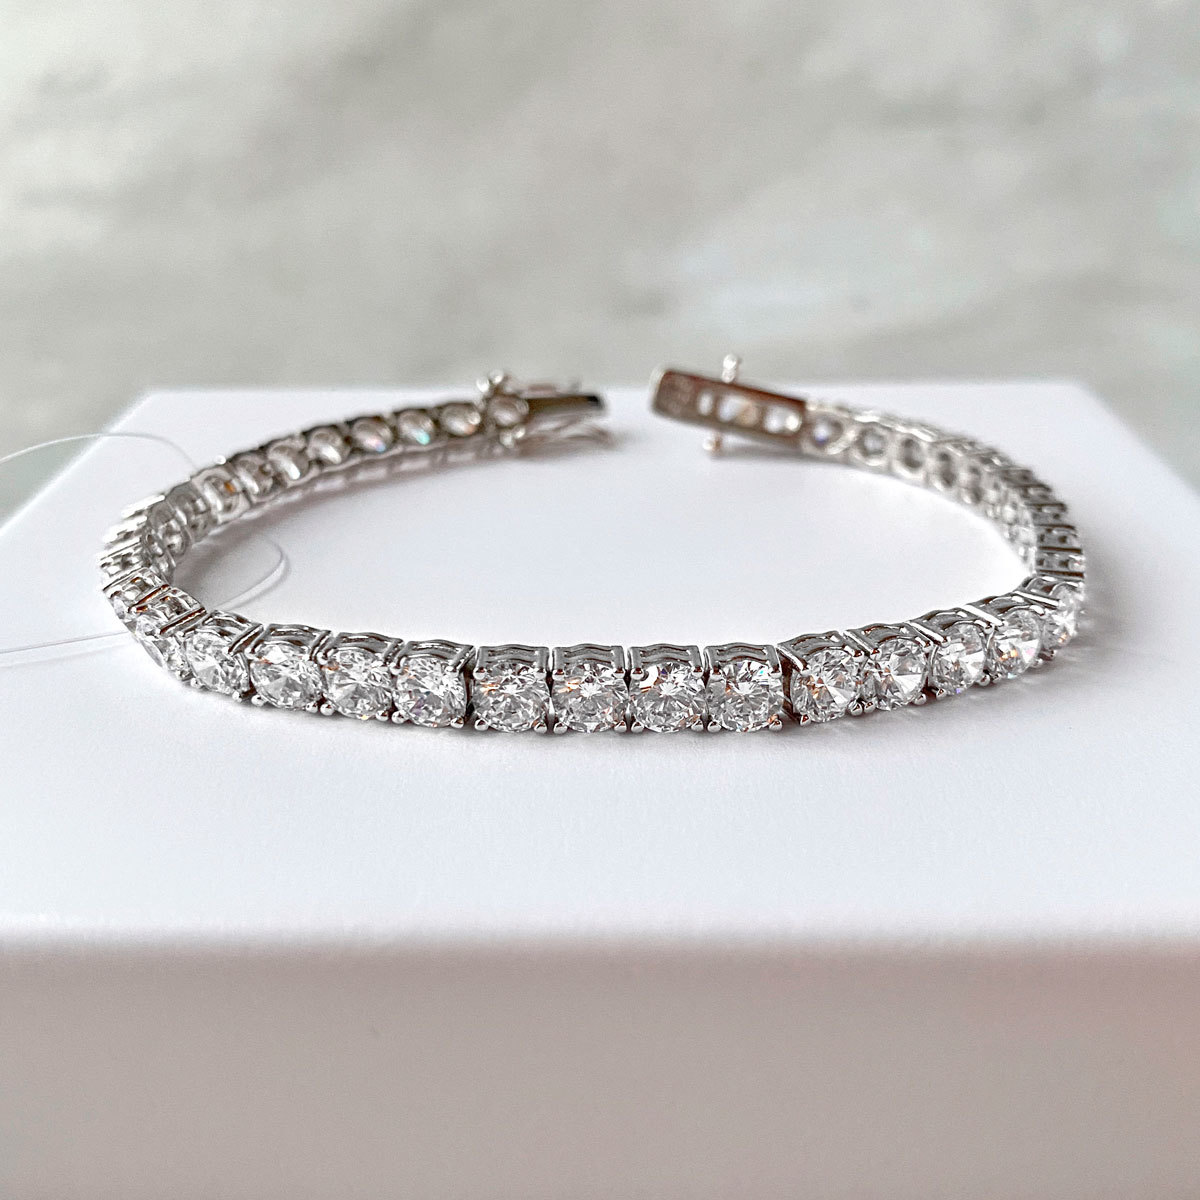 Браслет Теннисный огранки принцесс white diamond (серебро 925)